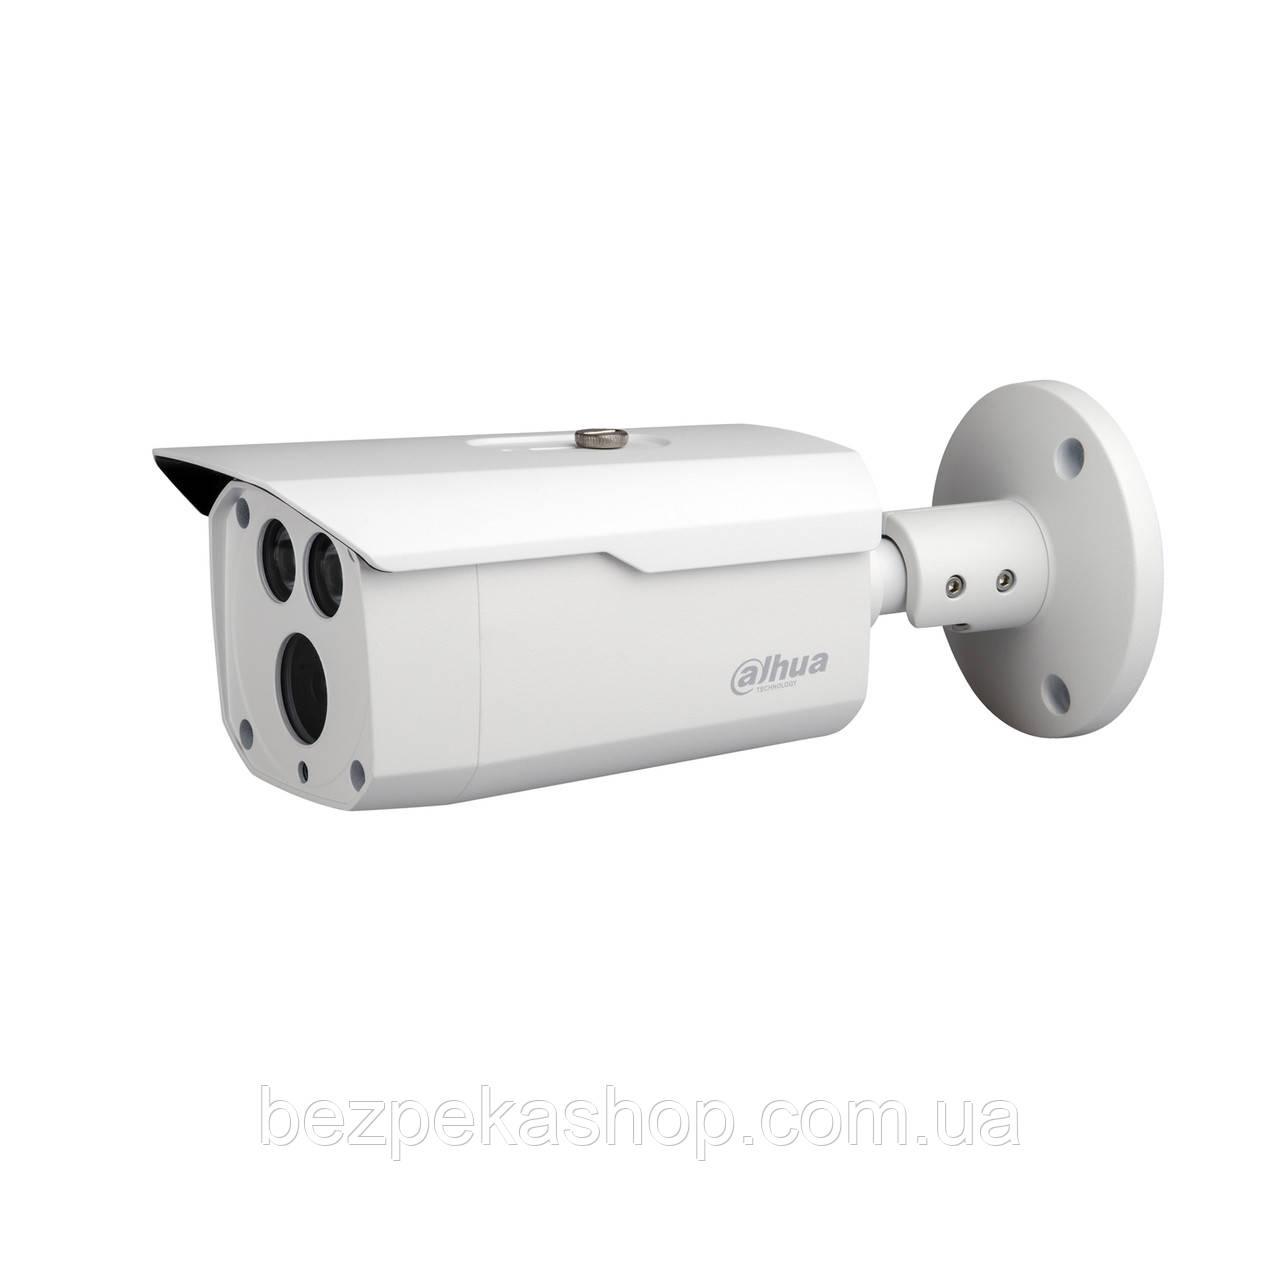 DH-HAC-HFW1400DP-B (3.6 мм)